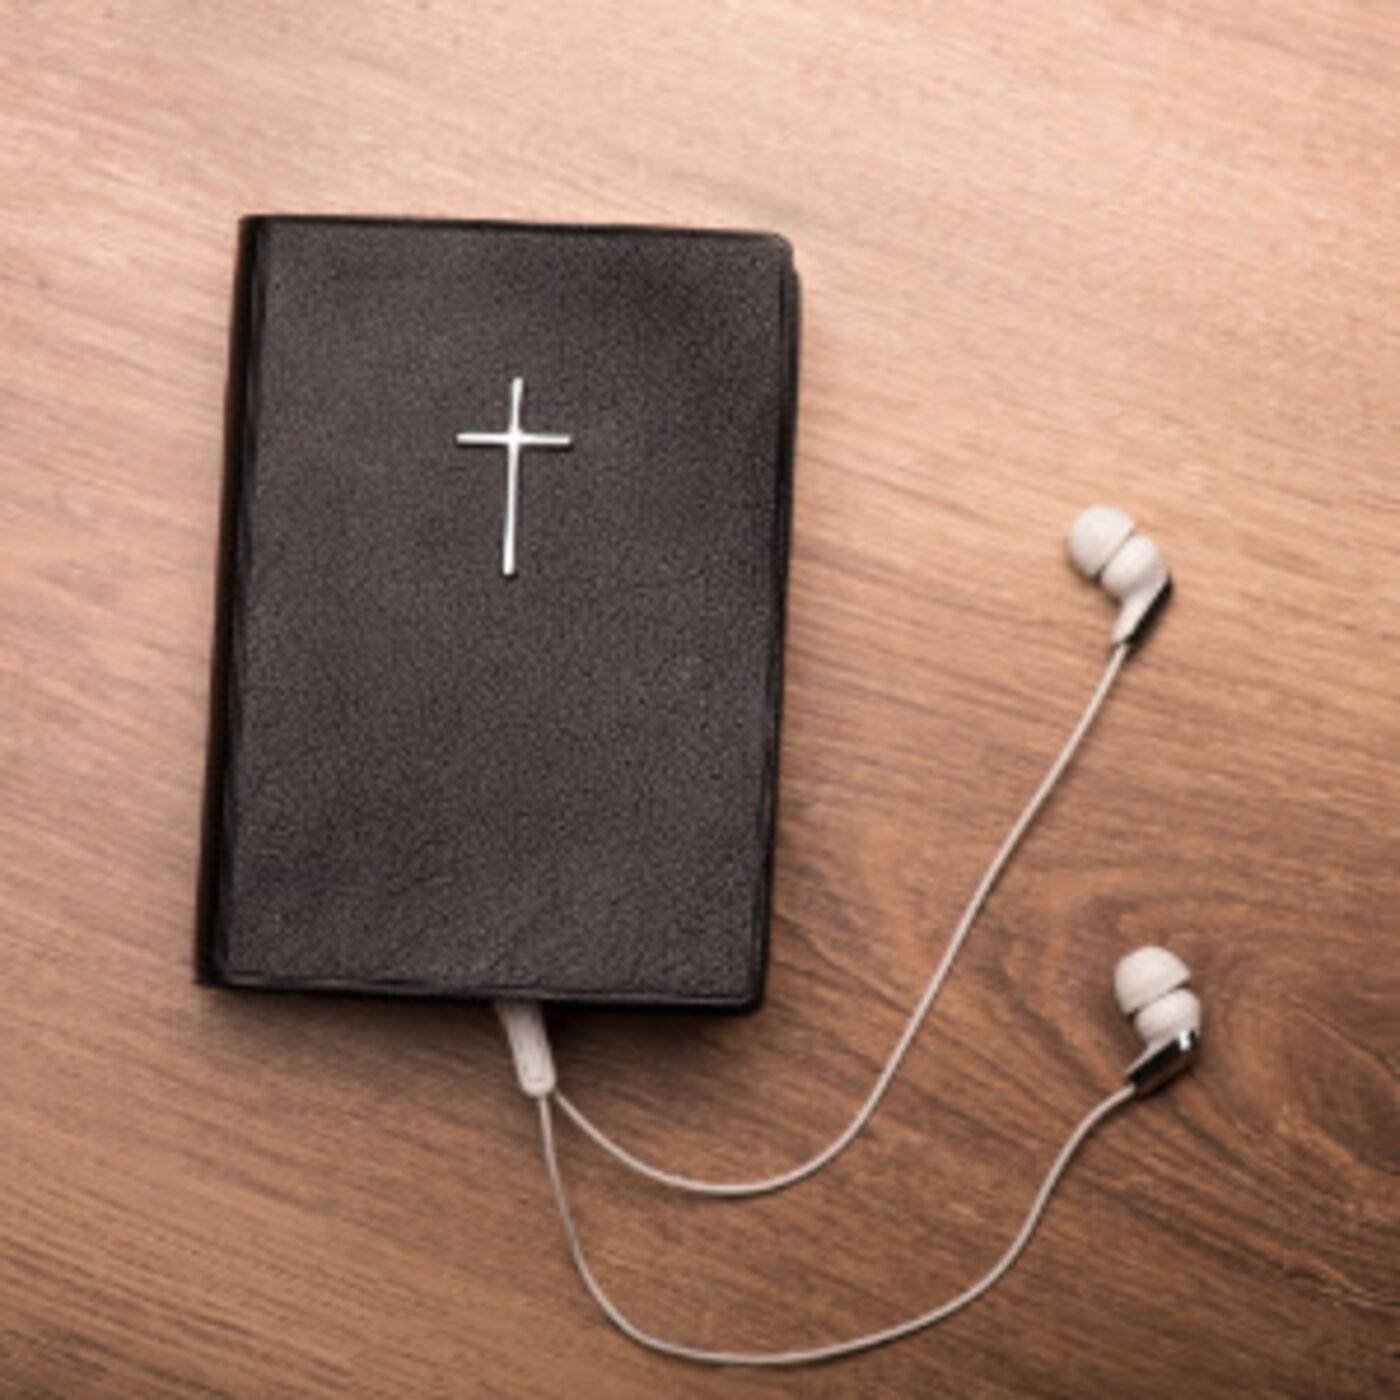 14. Practicing What You Preach ft. Rev. Brandee Jasmine Mimitzraiem